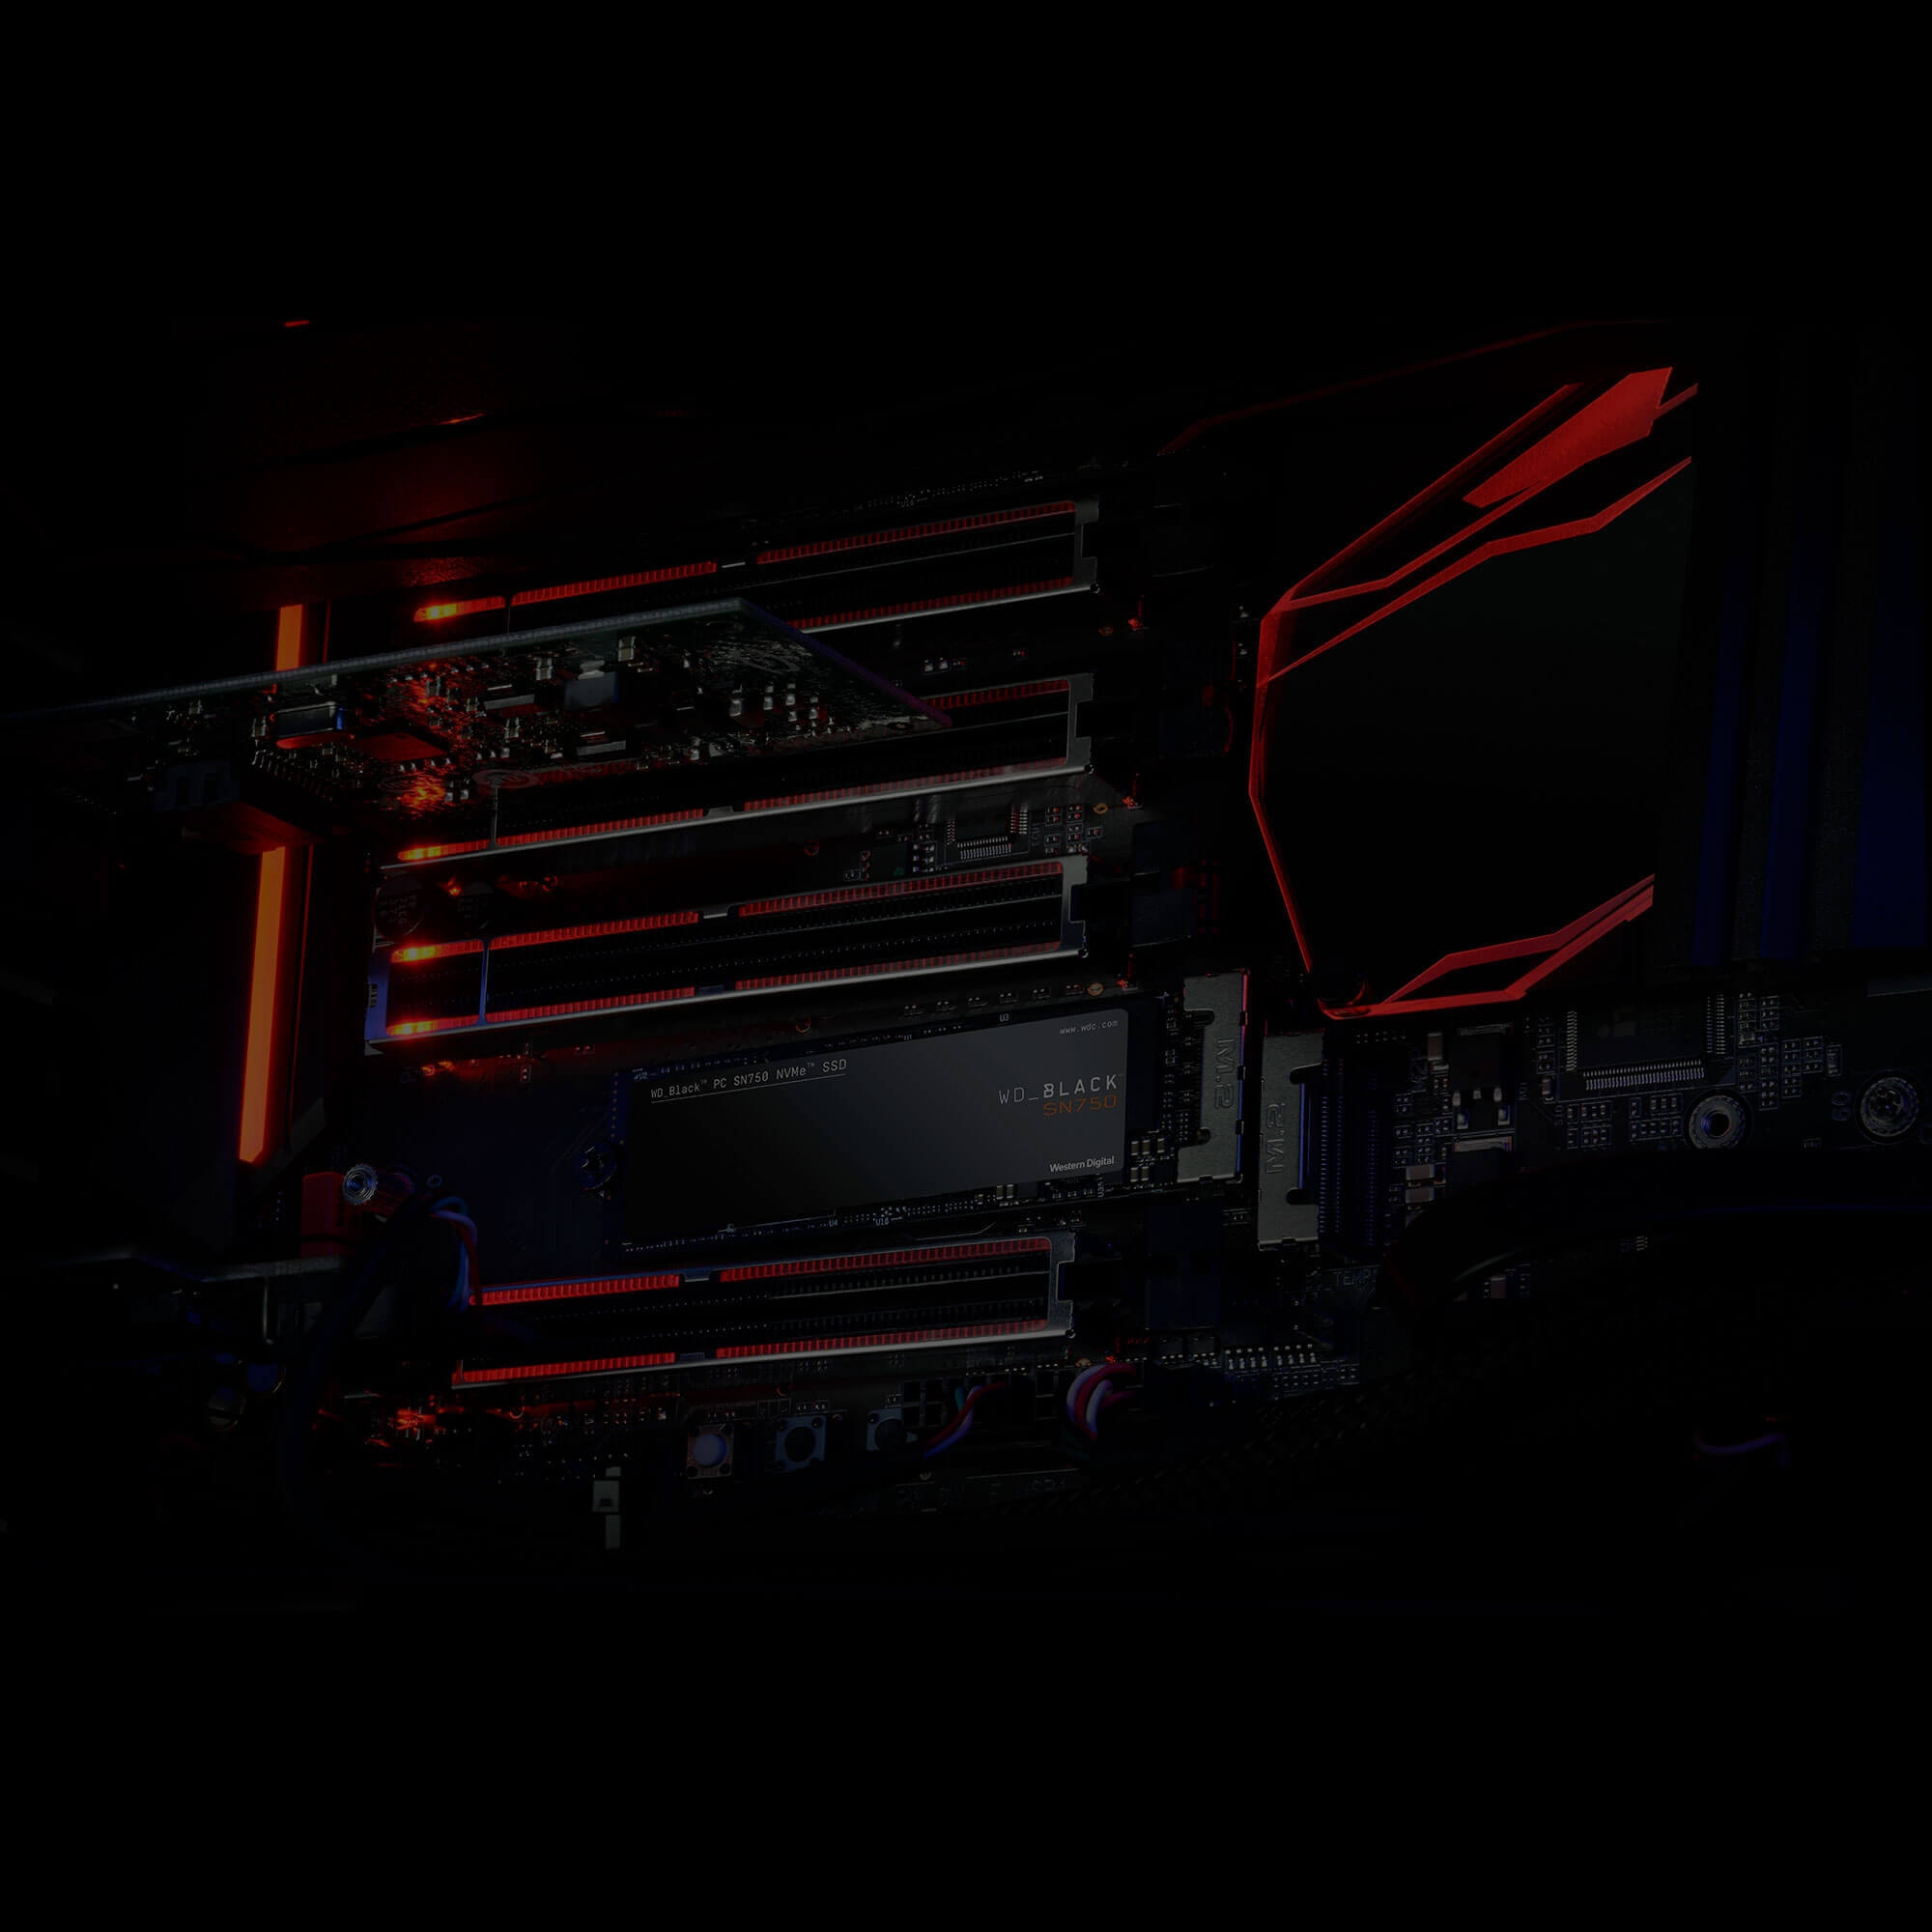 SSD Western Digital Black SN750 PCIe Gen3 x4 NVMe M.2 250GB WDS250G3X0C